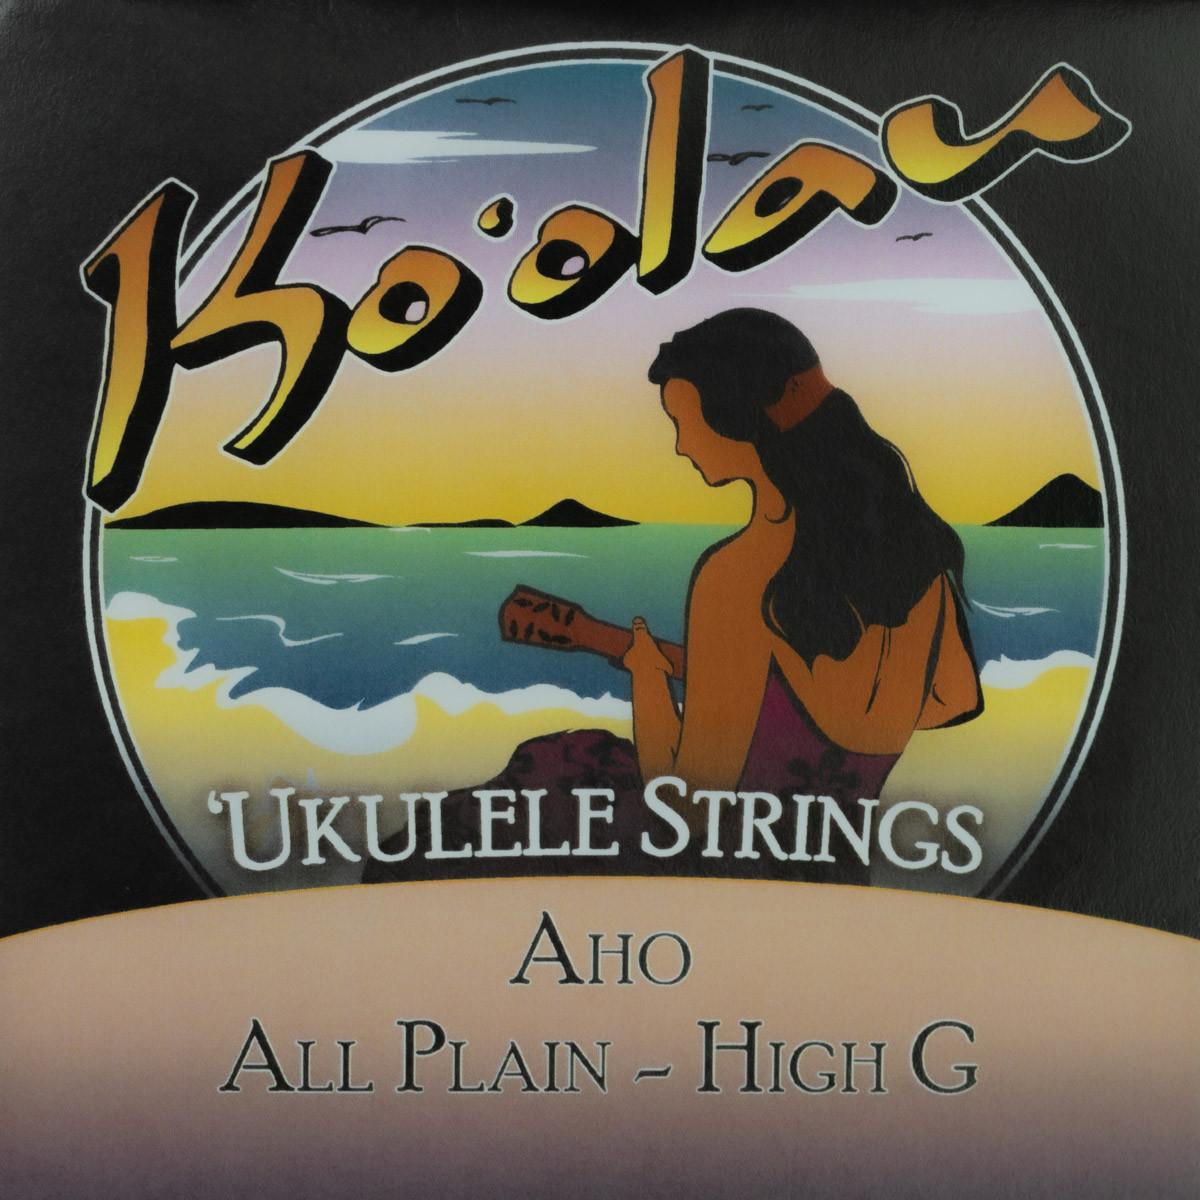 Ko'olau Aho - Fluorocarbon Strings (5 Options)